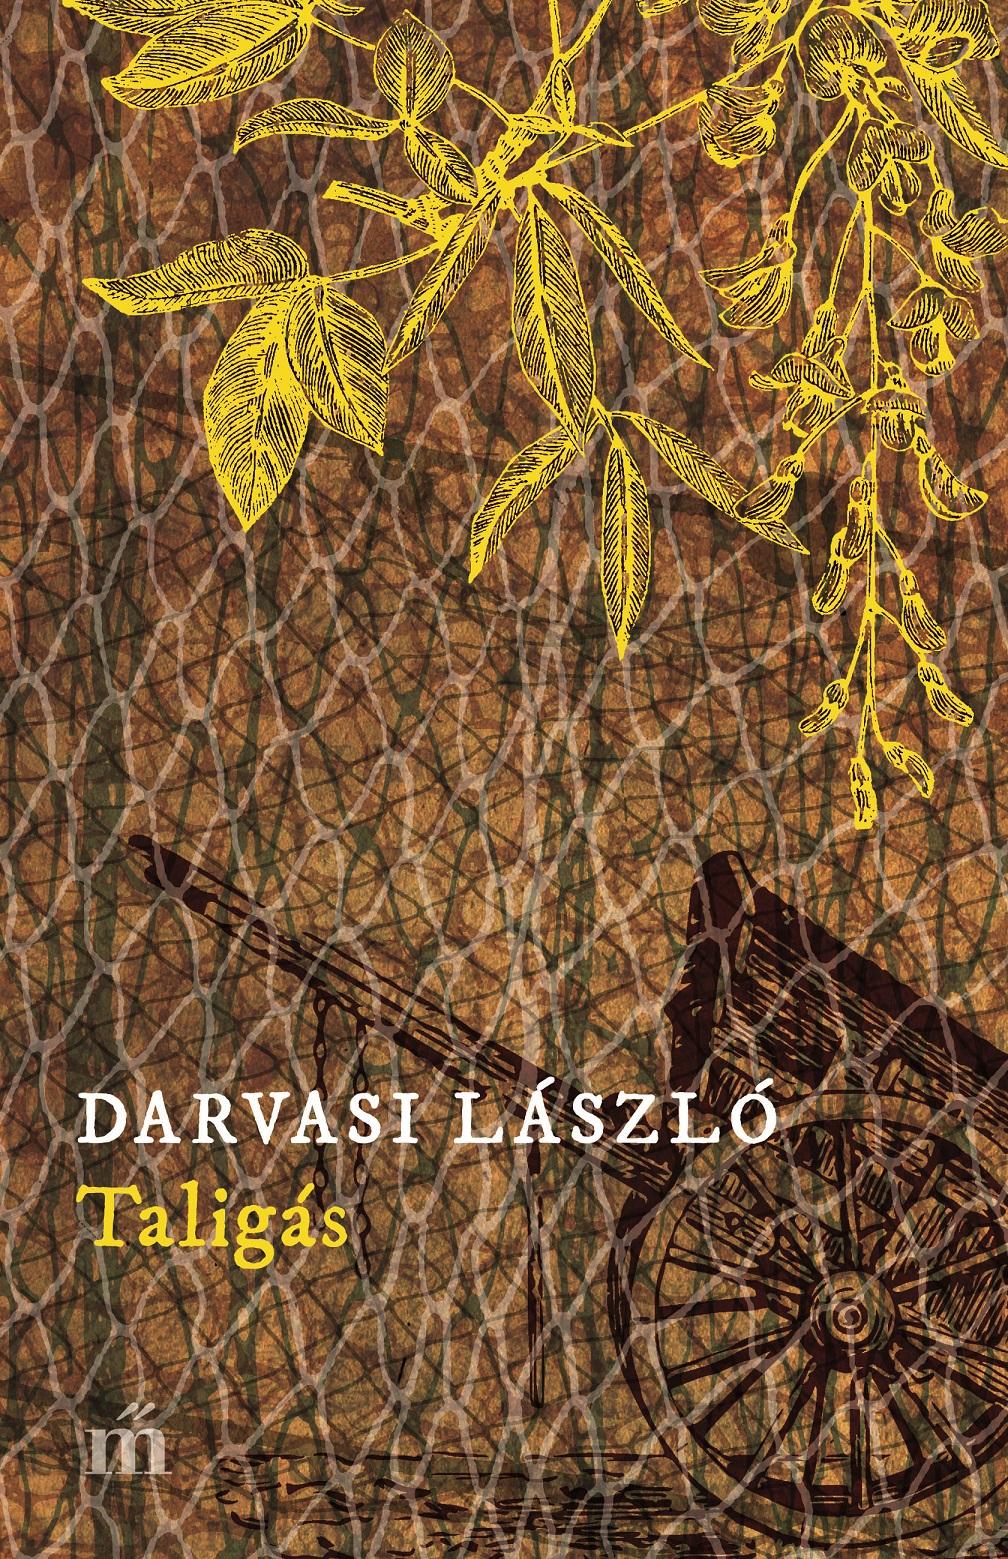 darvasi_laszlo-taligas-b1